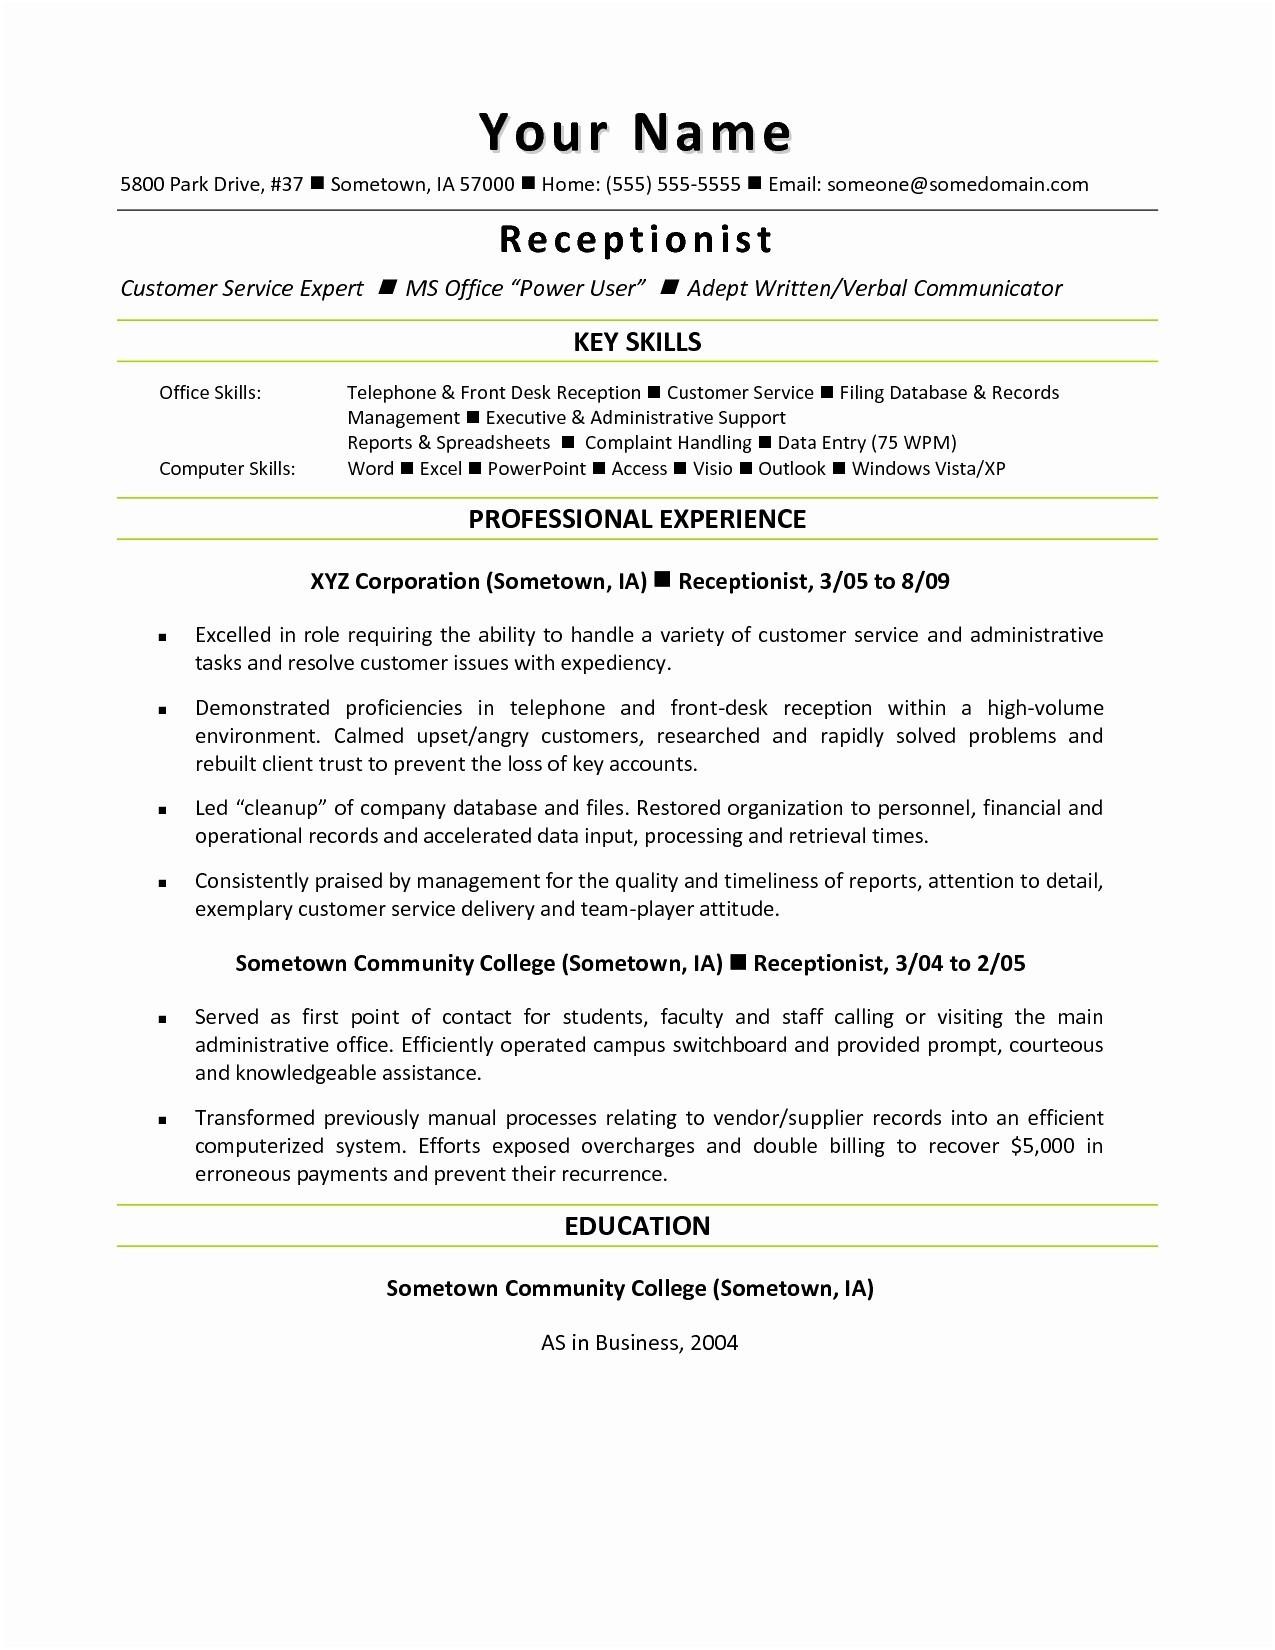 Microsoft Word Resume Cover Letter Template - Resume Microsoft Word Fresh Resume Mail format Sample Fresh